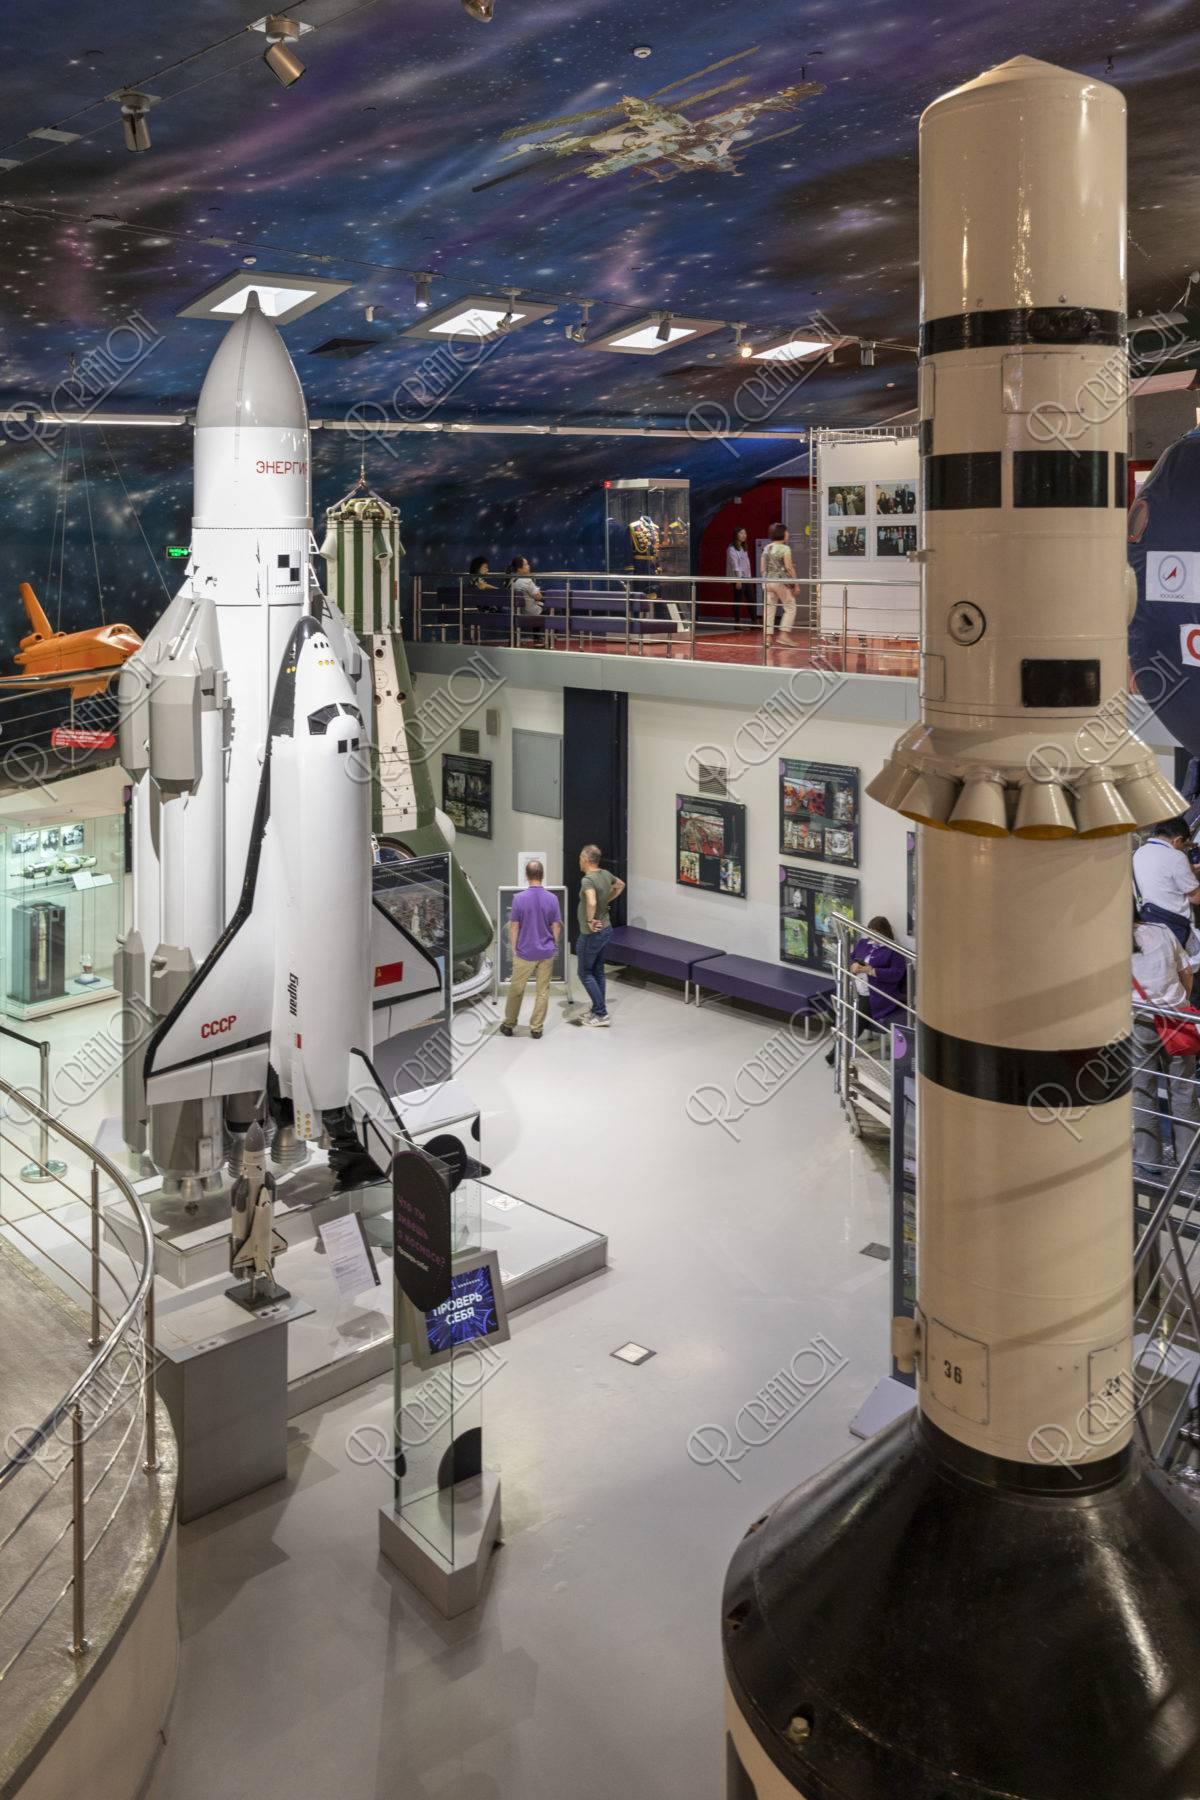 宇宙飛行士記念博物館 内部 シャトル